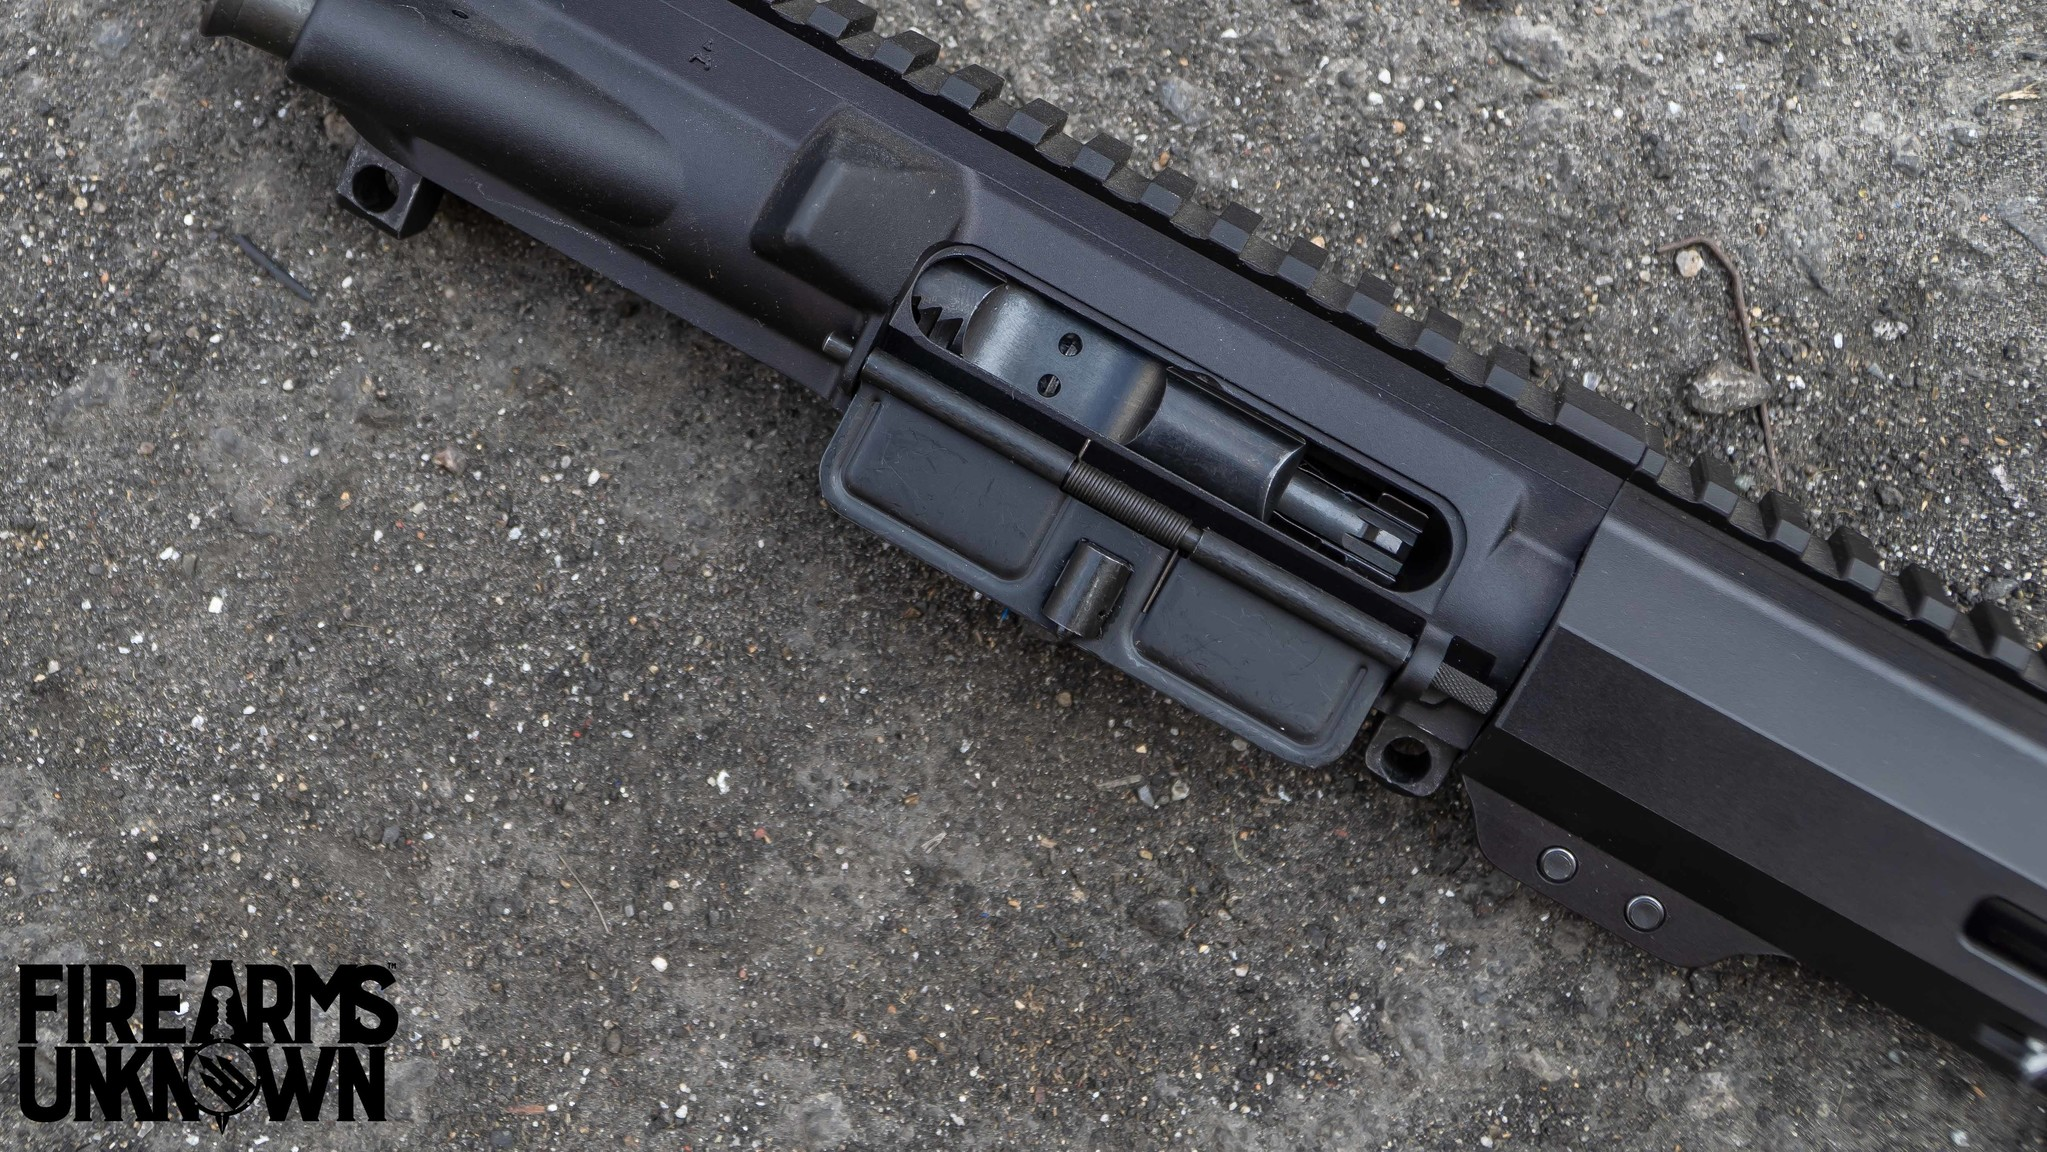 FU Bug Upper 16'' Carbine, 5.56, 1/7, 4150V Black Nitrite, Upper